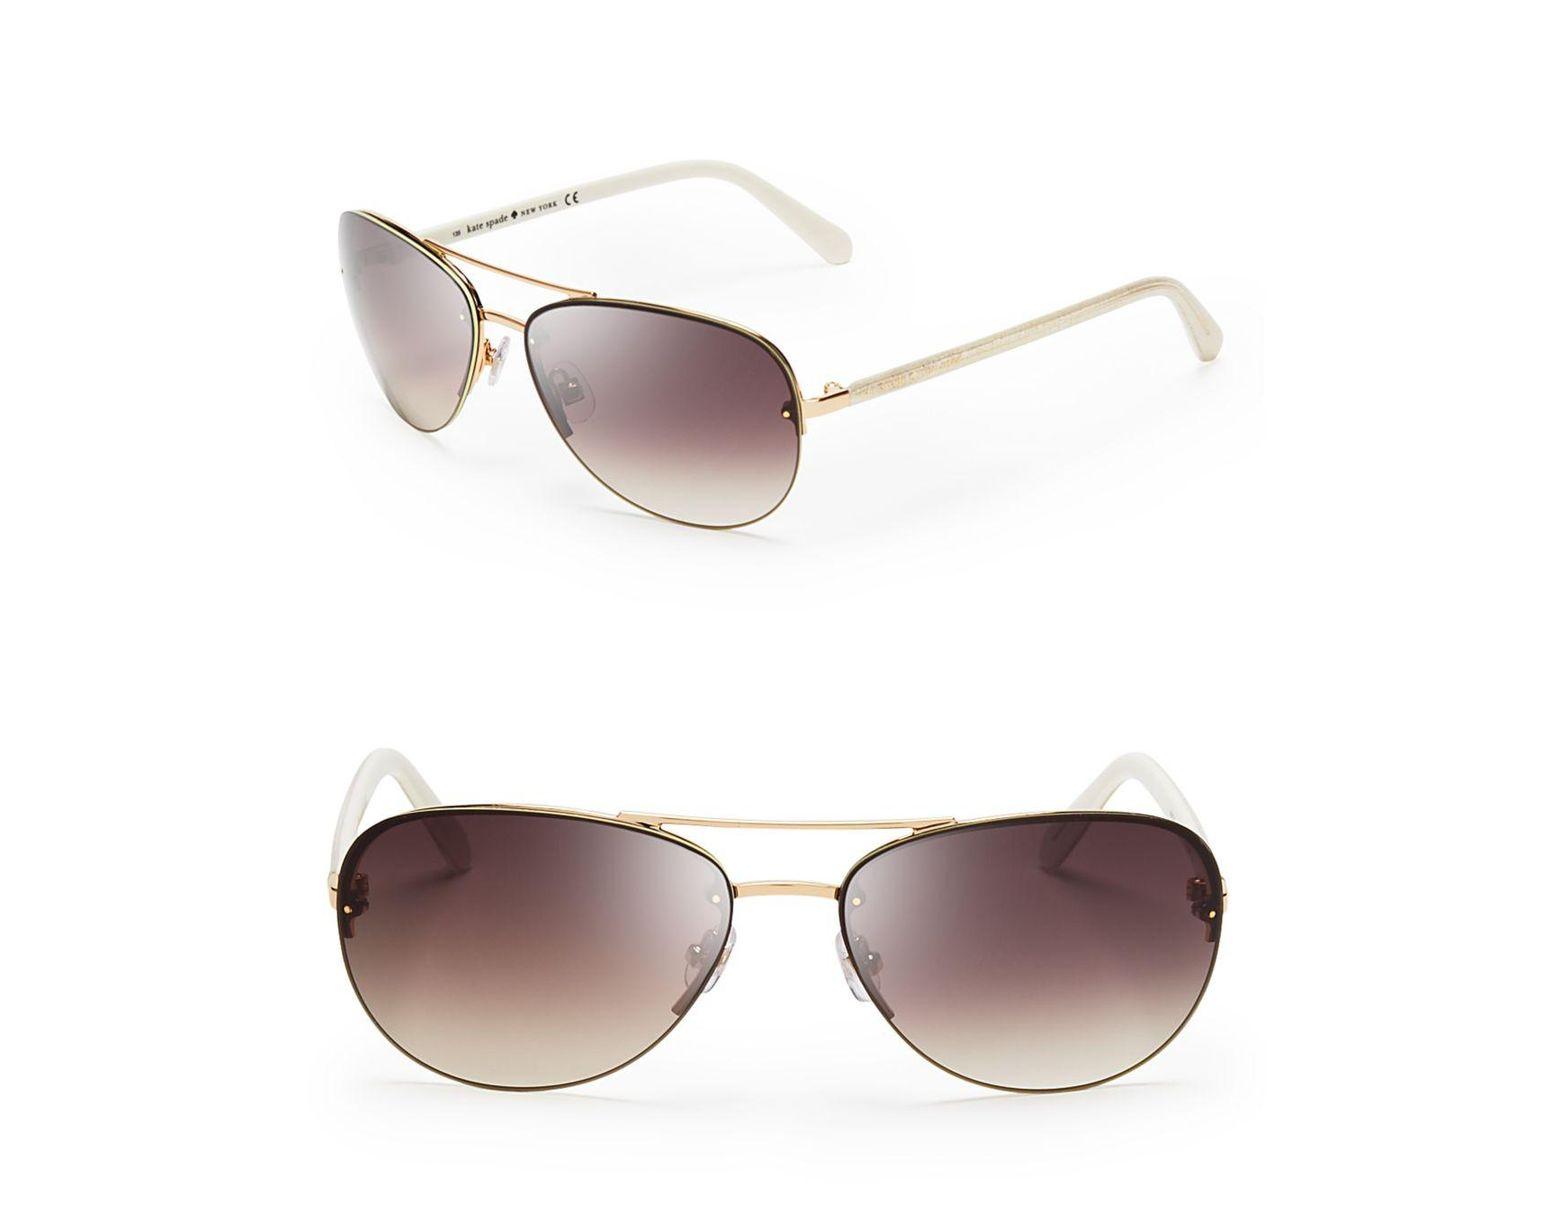 eeceefa3b Kate Spade Women's Beryl Aviator Sunglasses in White - Save 6% - Lyst